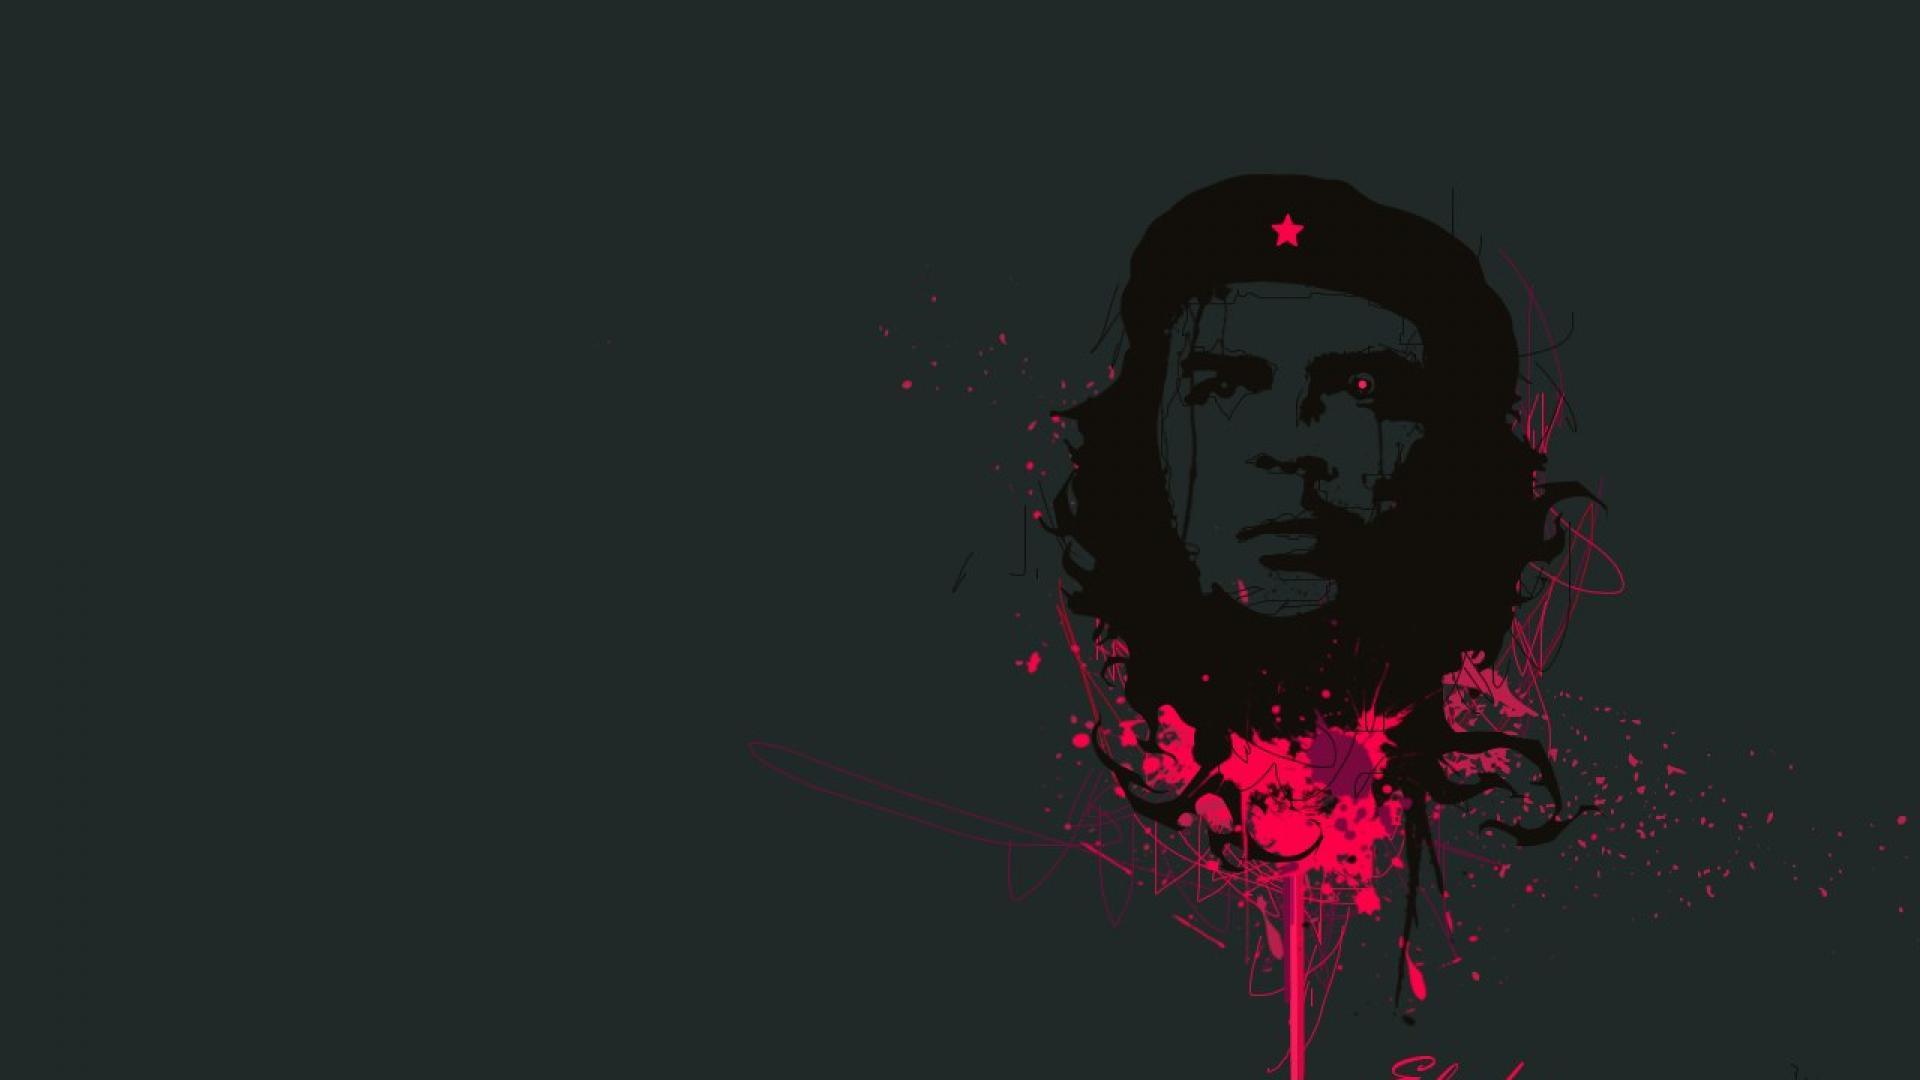 Che Guevara Wallpaper 1920x1080